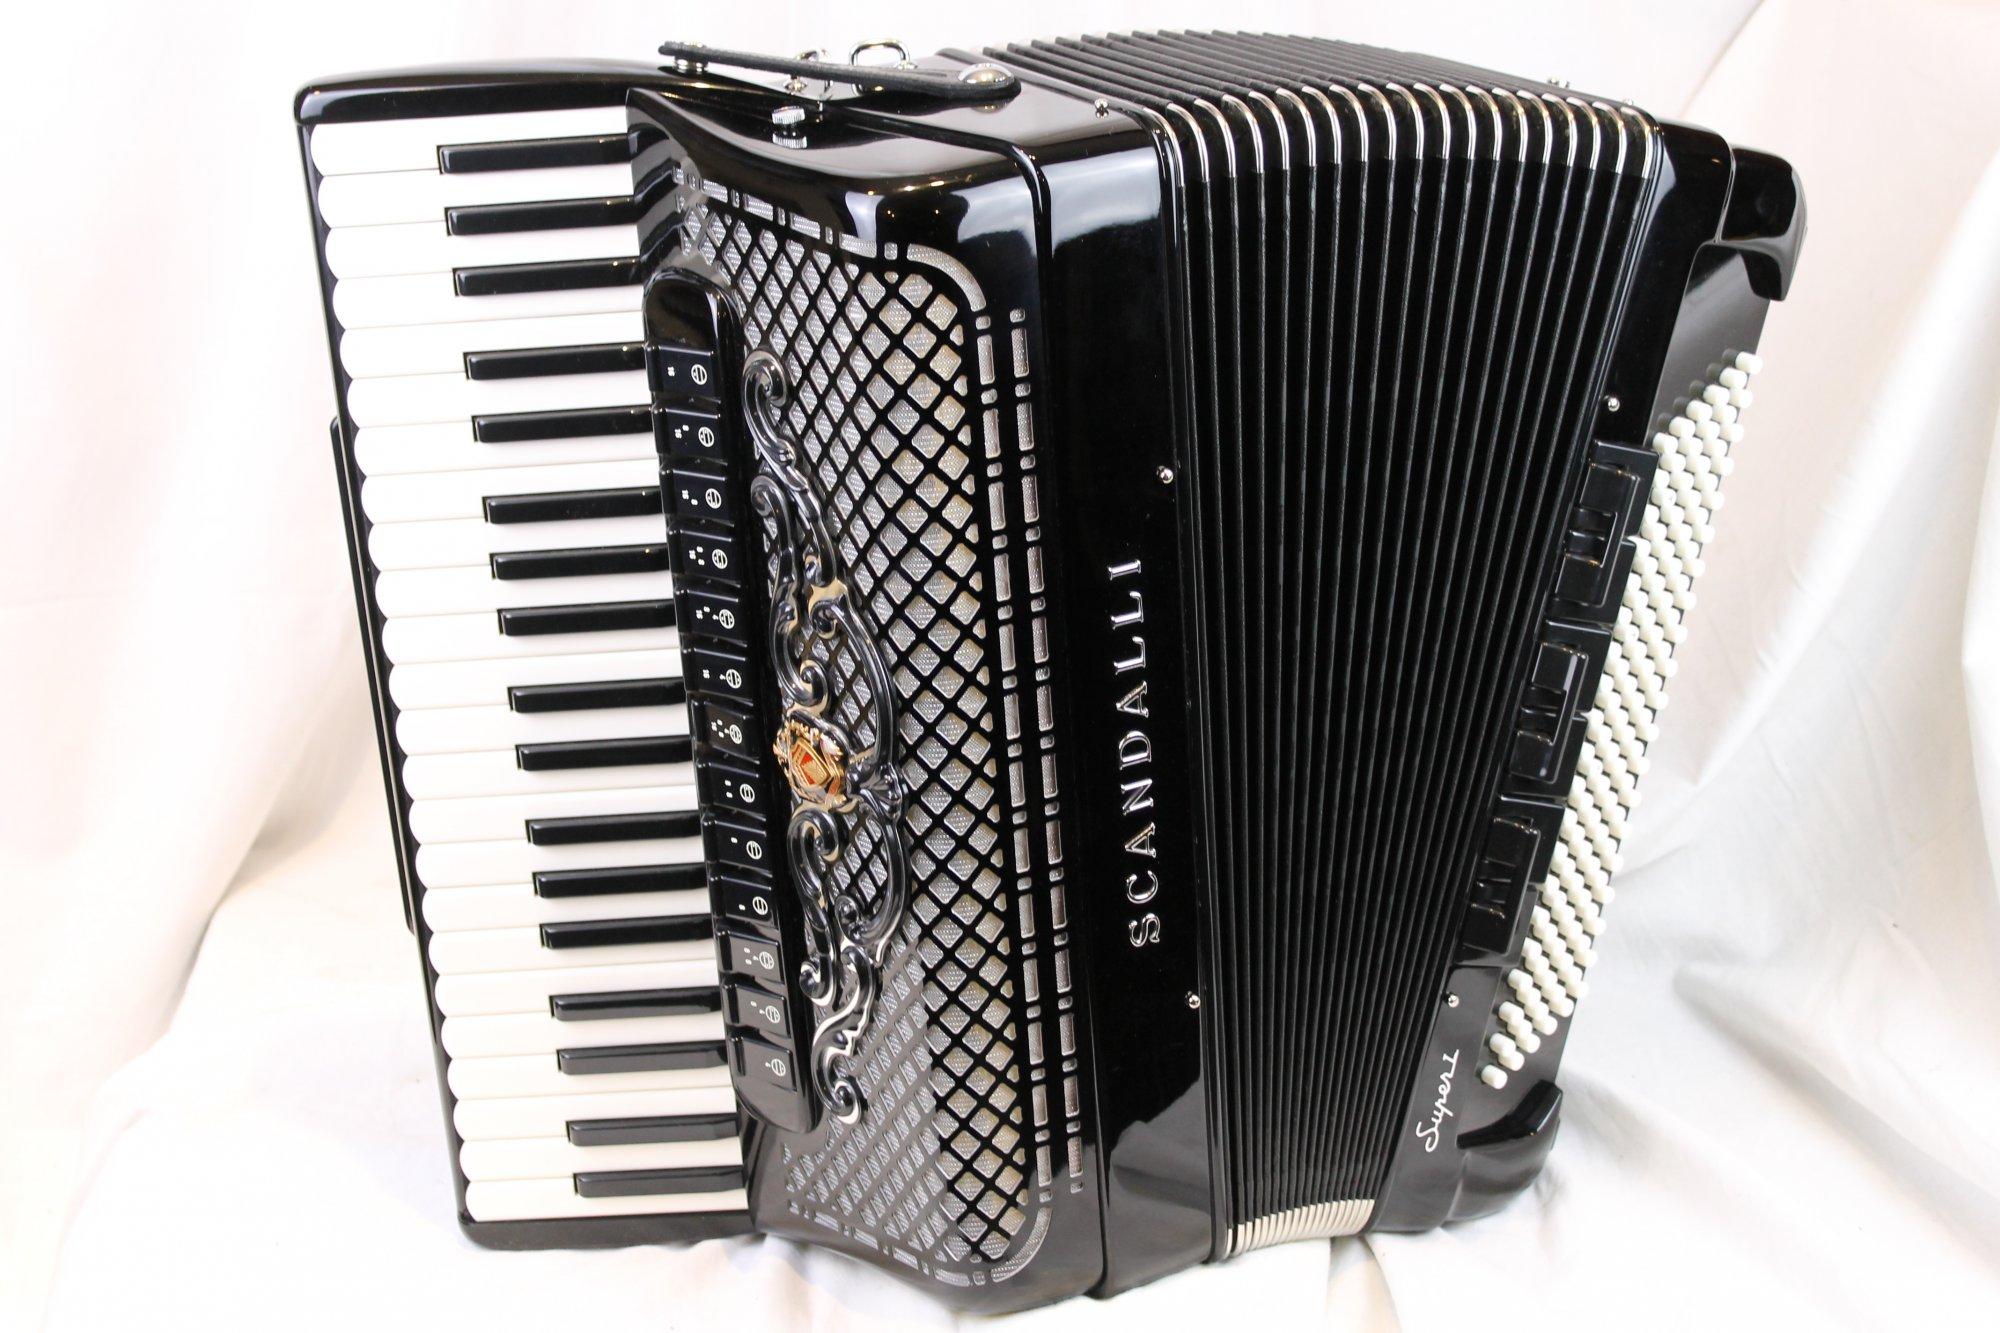 NEW Black Scandalli Super L Piano Accordion LMMH 41 120